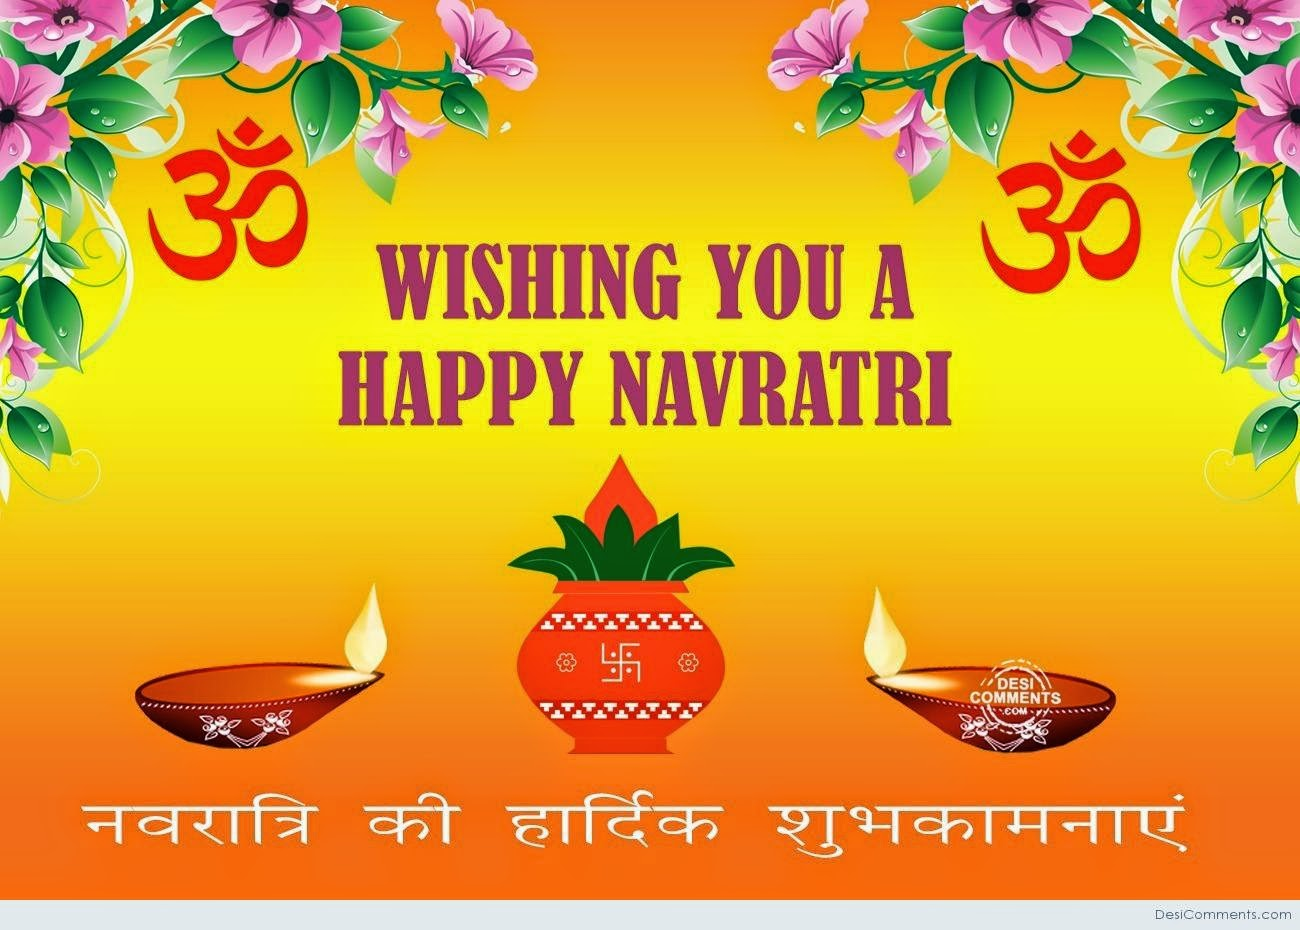 Wishing you a happy navratri greeting card kristyandbryce Choice Image